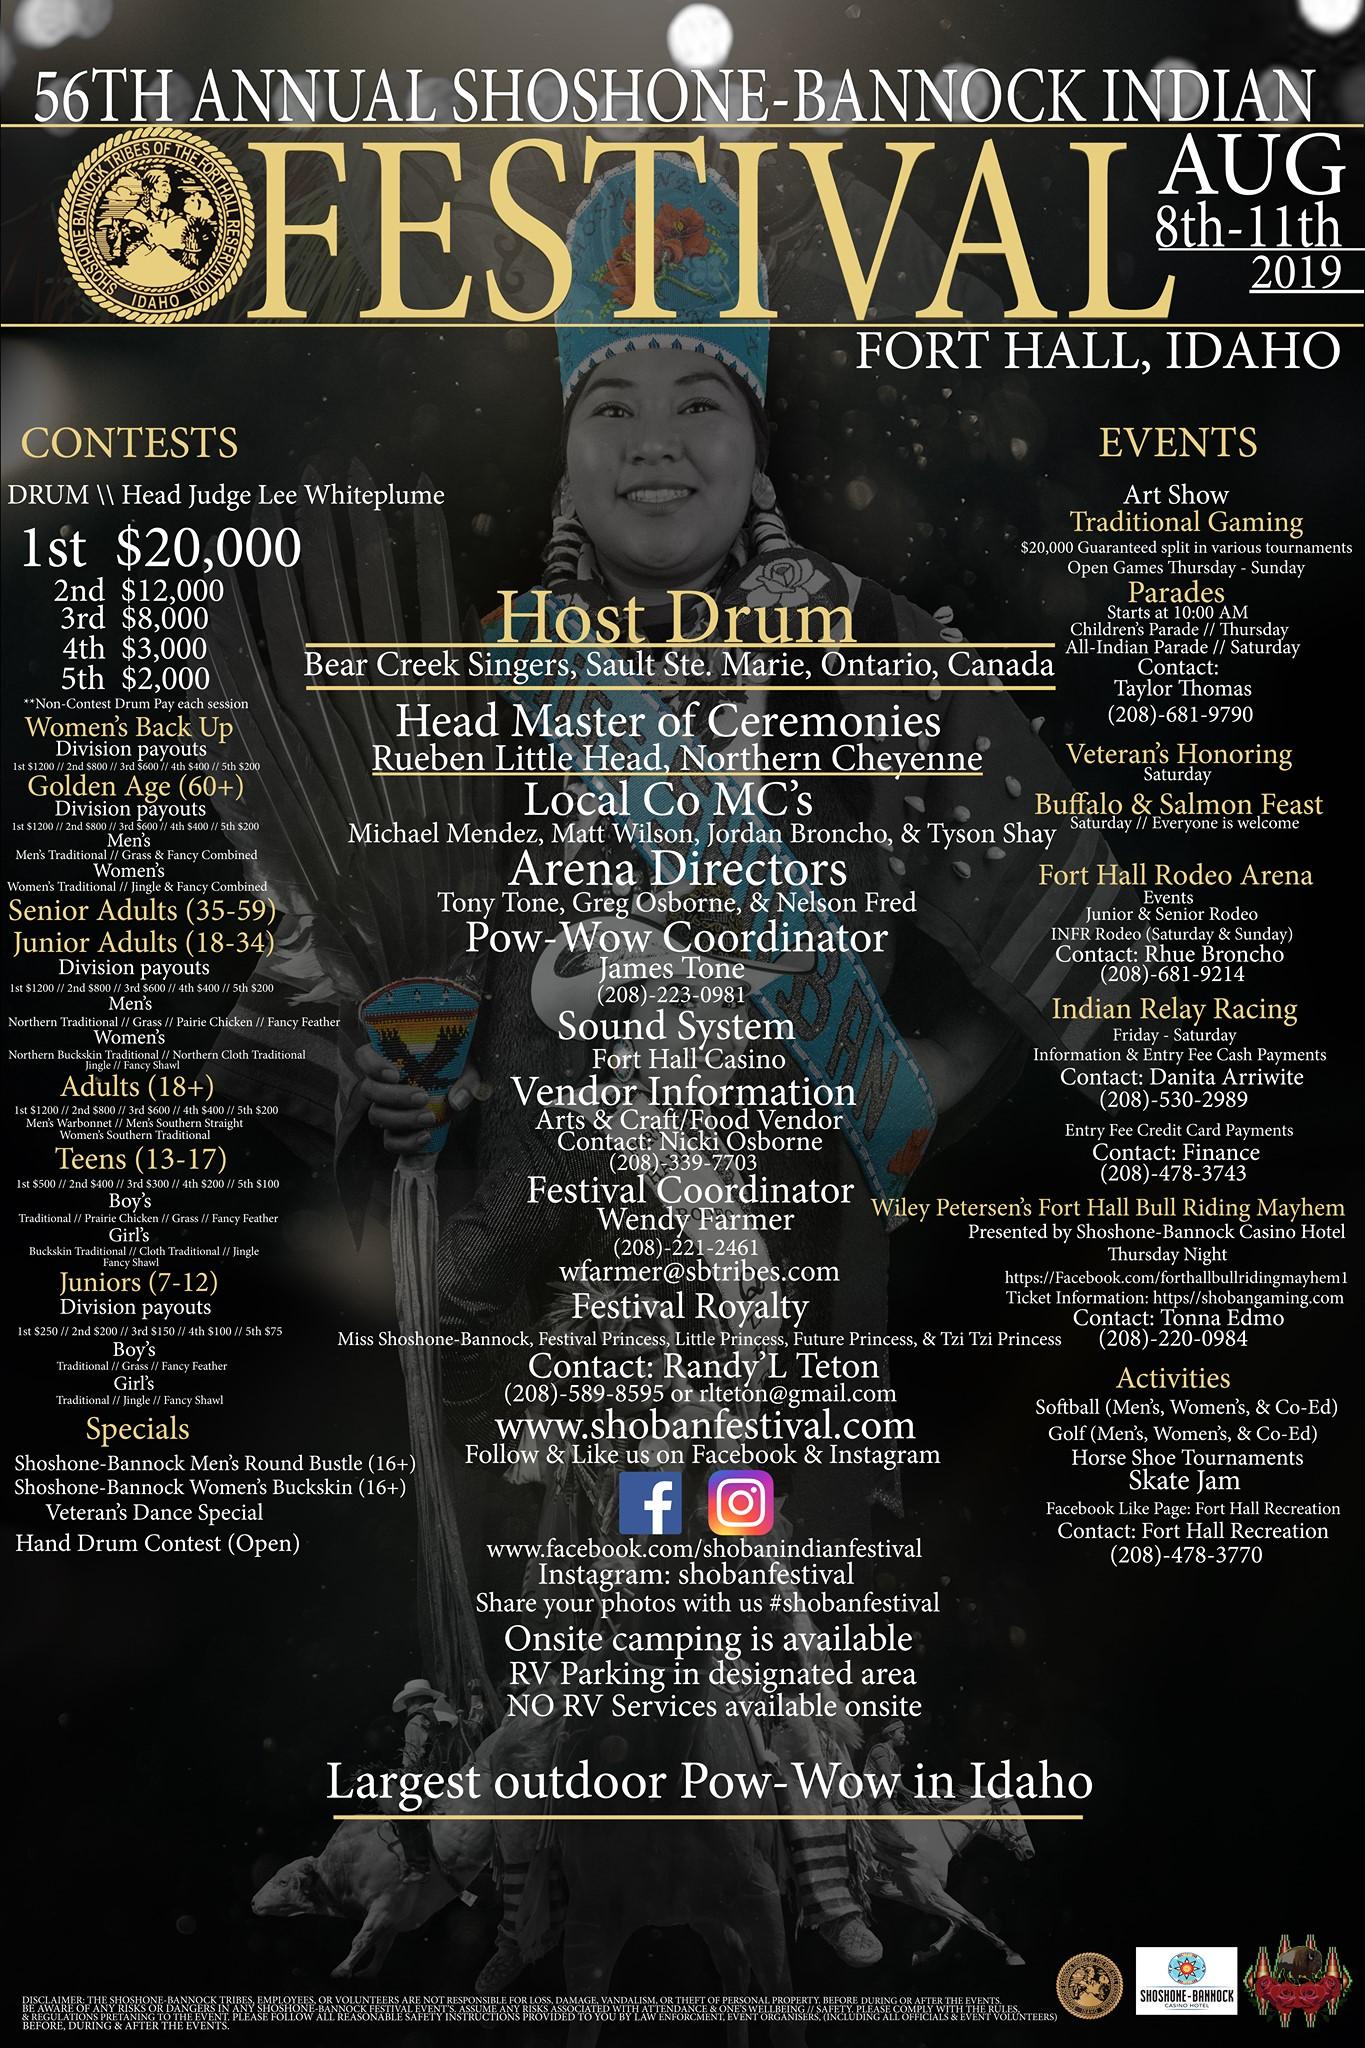 Shoshone-Bannock Indian Festival, Fort Hall Idaho